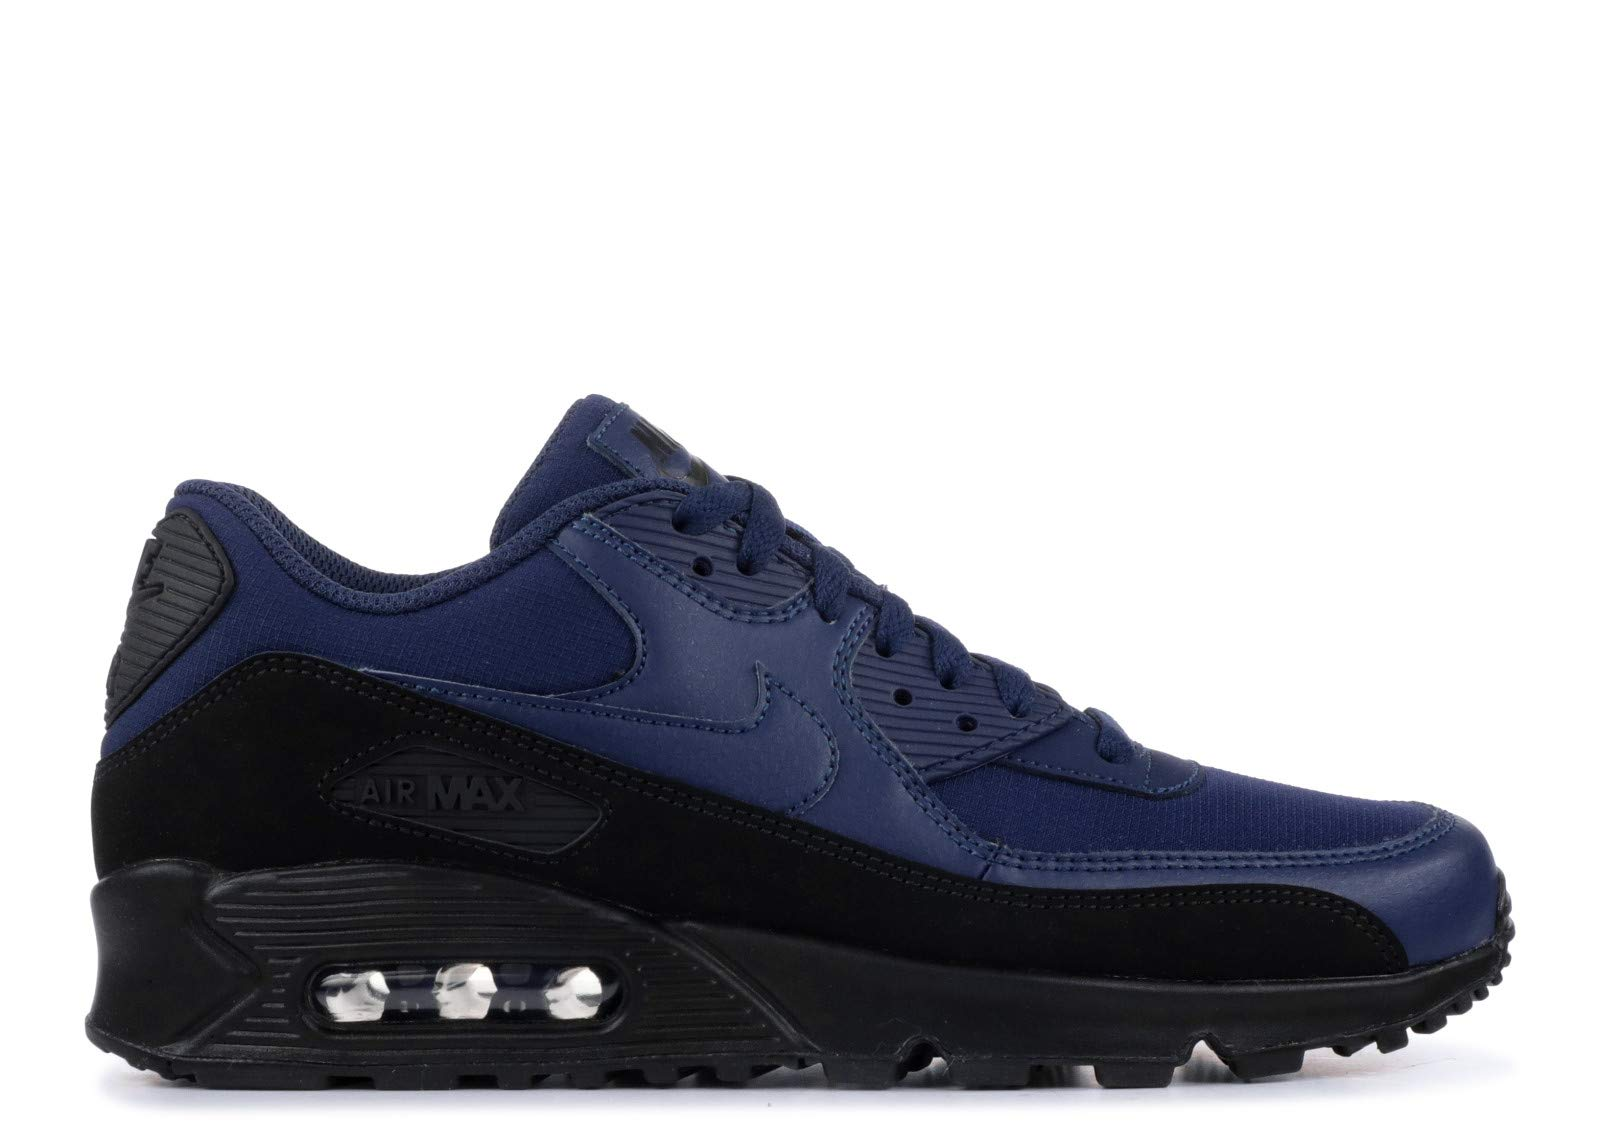 Nike Mens Air Max 90 Essential Running Shoes BlackMidnight Navy AJ1285 007 Size 10.5